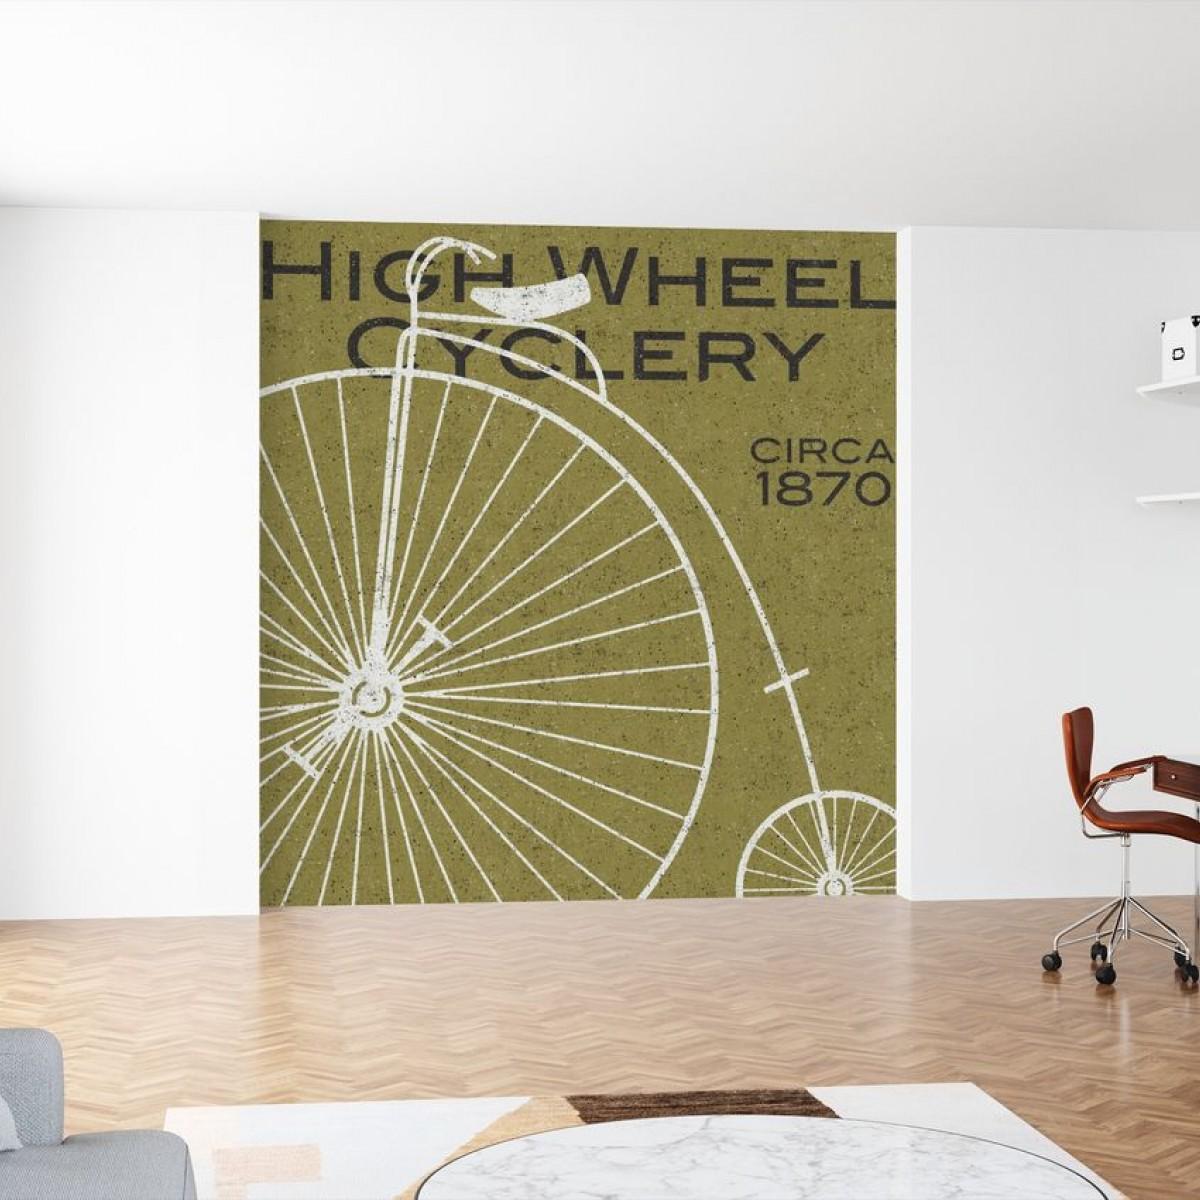 Fototapet High Wheel Cyclery, personalizat, Photowall